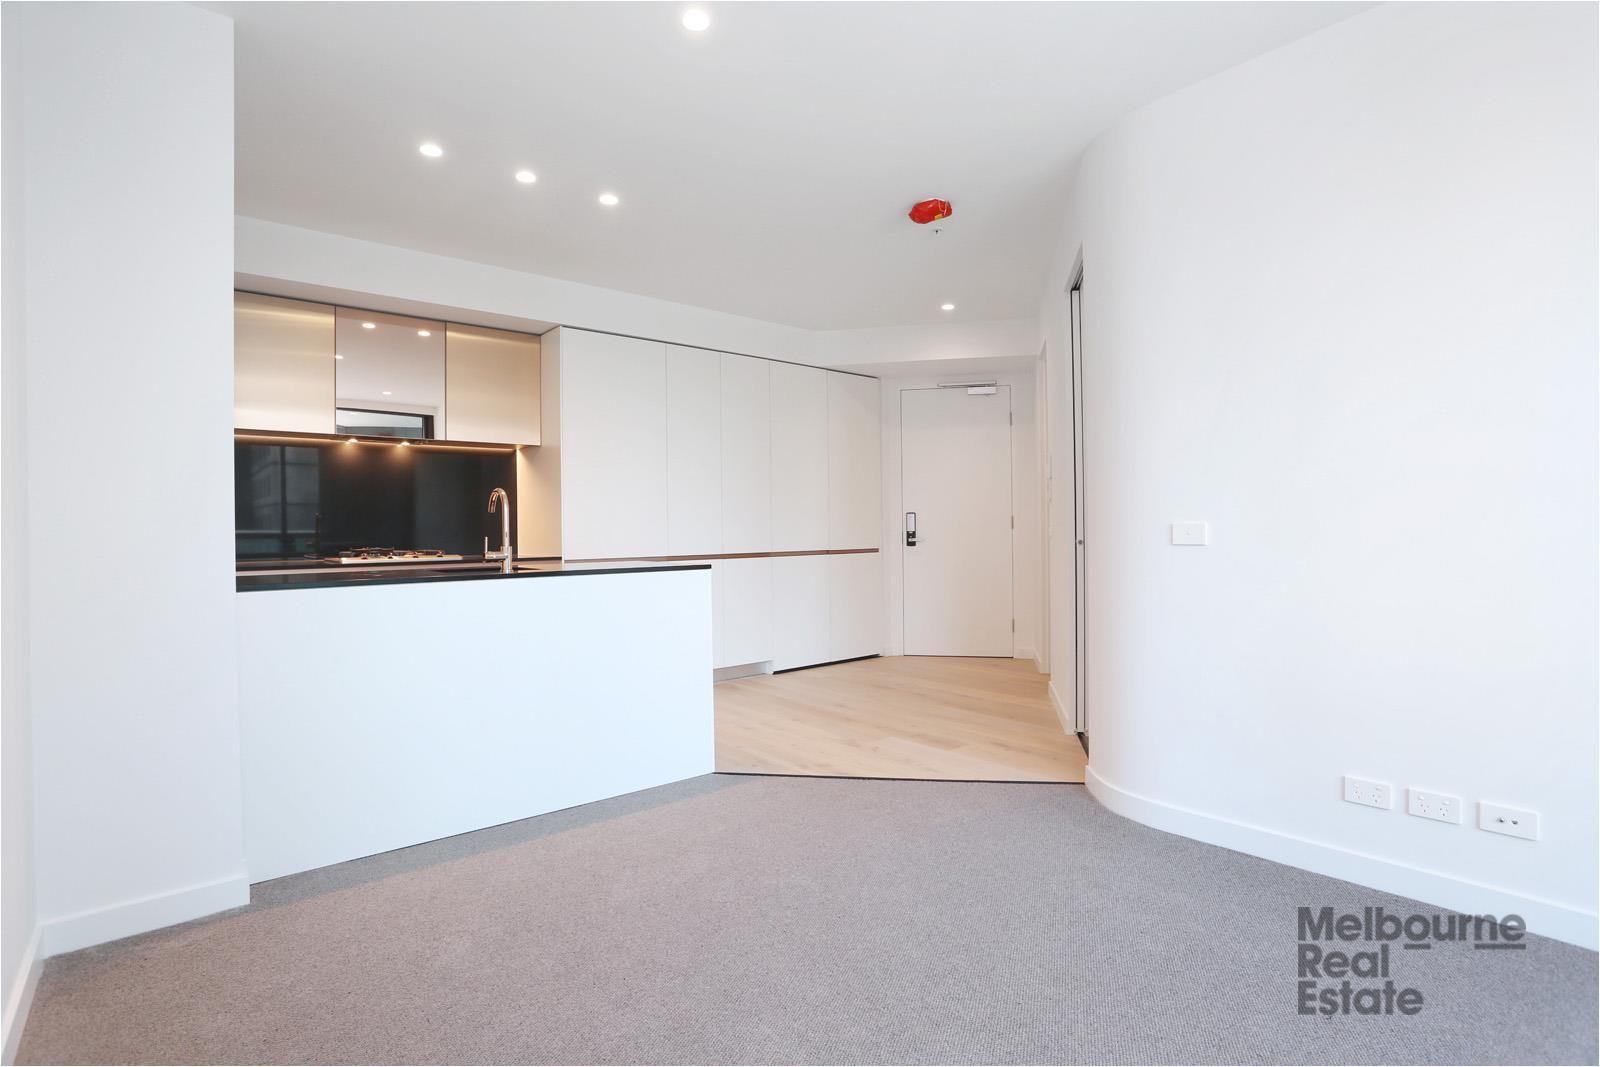 228 La Trobe Street, Melbourne VIC 3000, Image 1